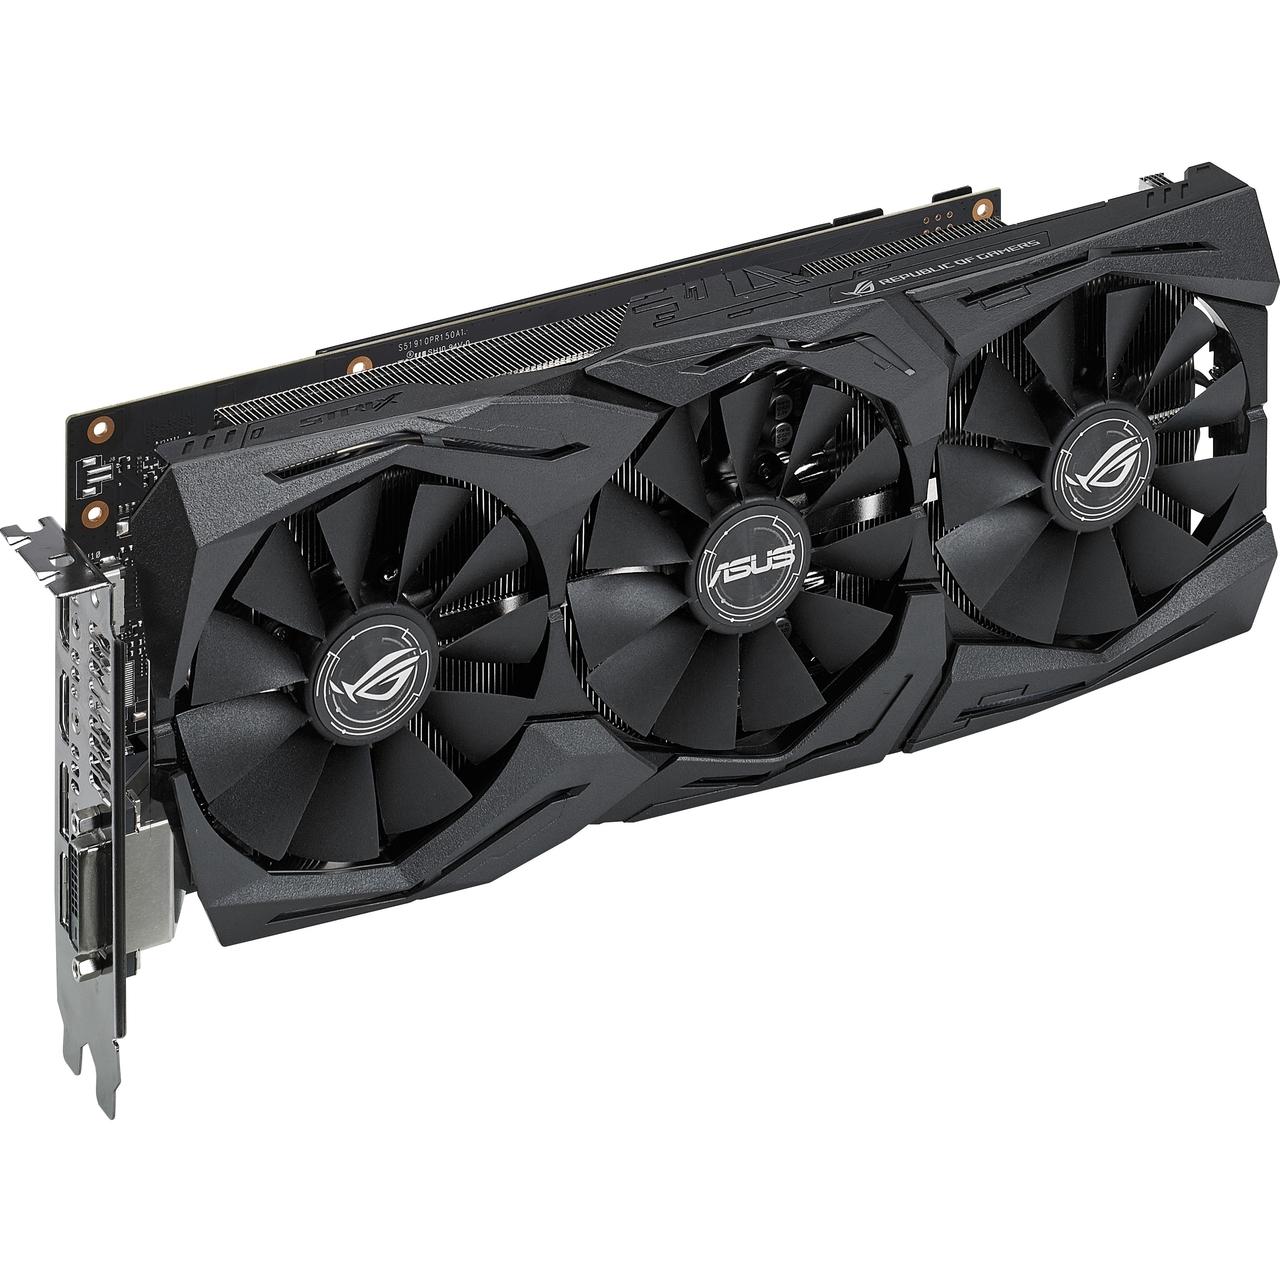 ASUS ROG STRIX GEFORCE GTX 1060 6GB DDR5